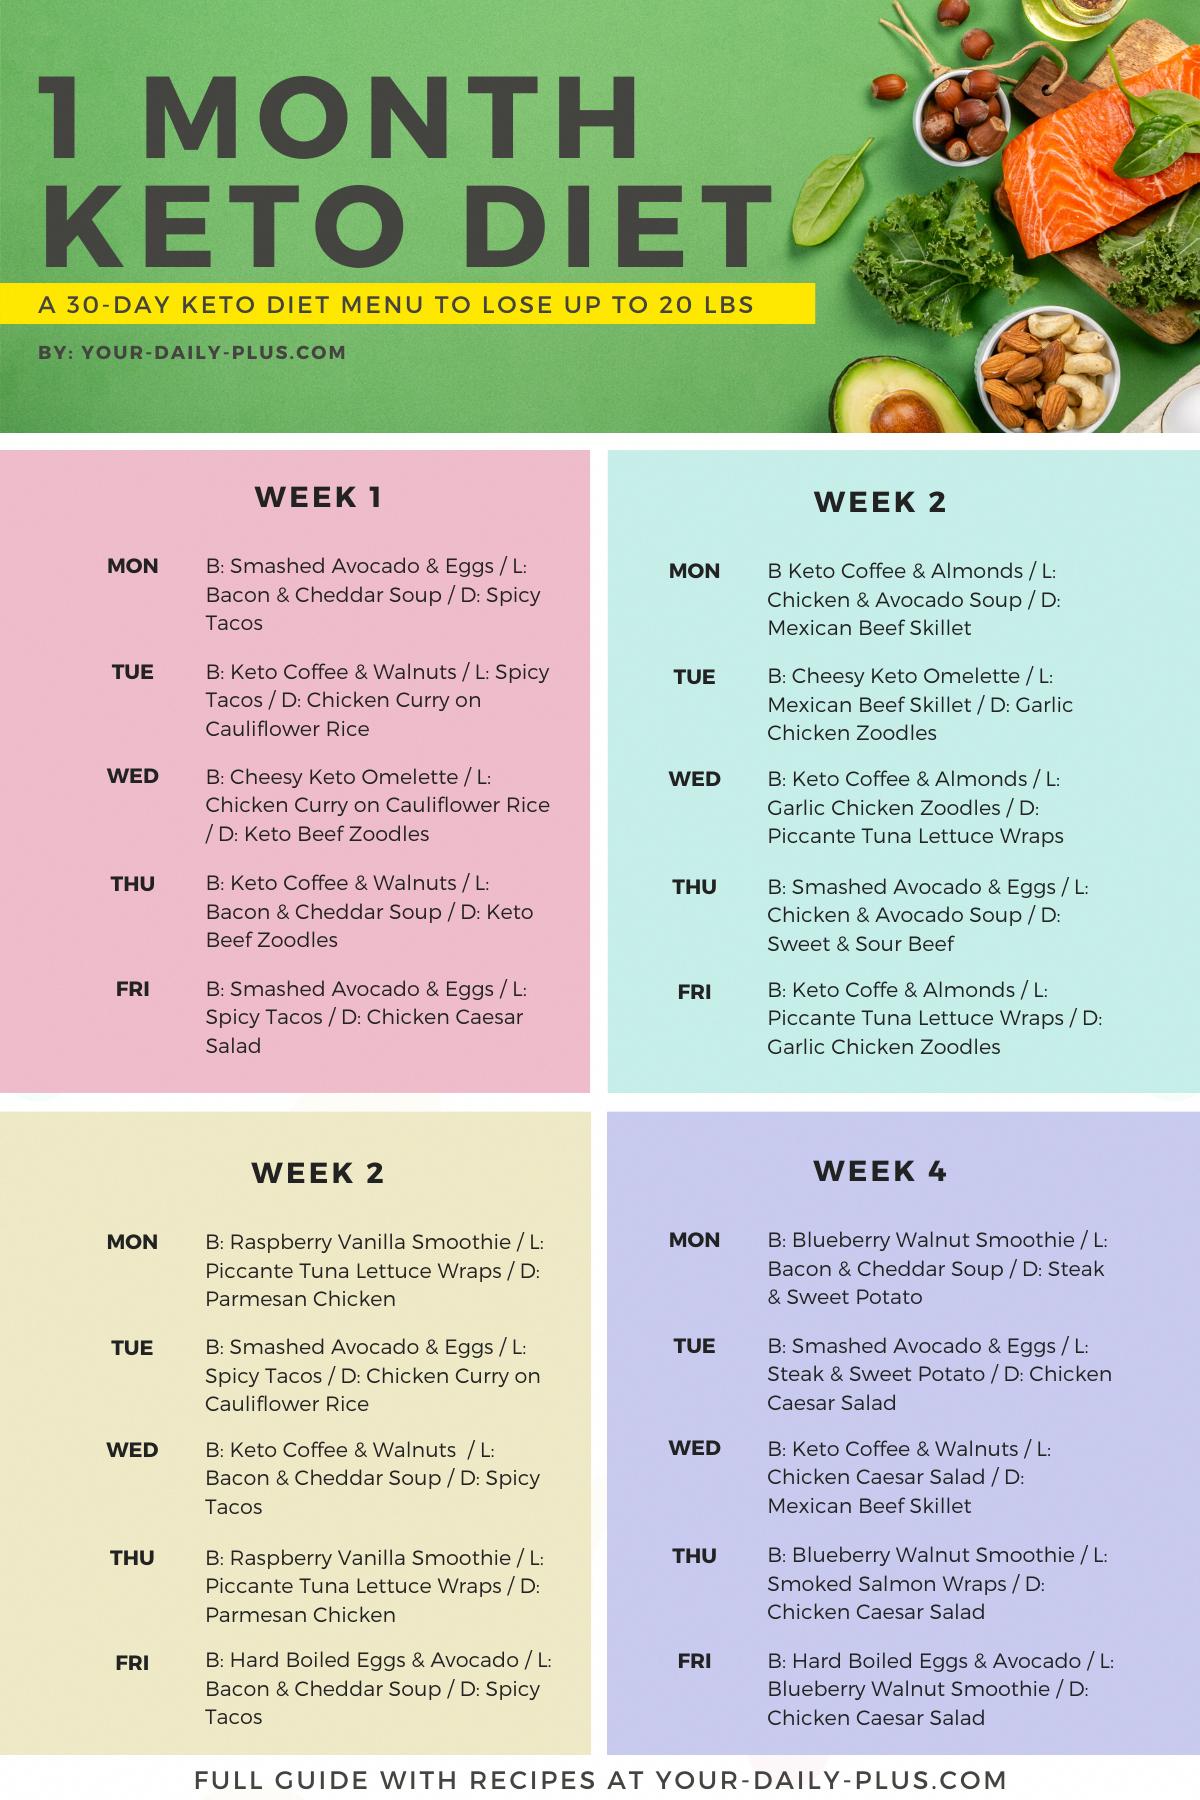 Keto Diet Menu 30 Day Keto Meal Plan For Beginners 30day Beginners Diet Keto Ketogeni Keto Diet Guide Ketogenic Diet Meal Plan Keto Diet Menu